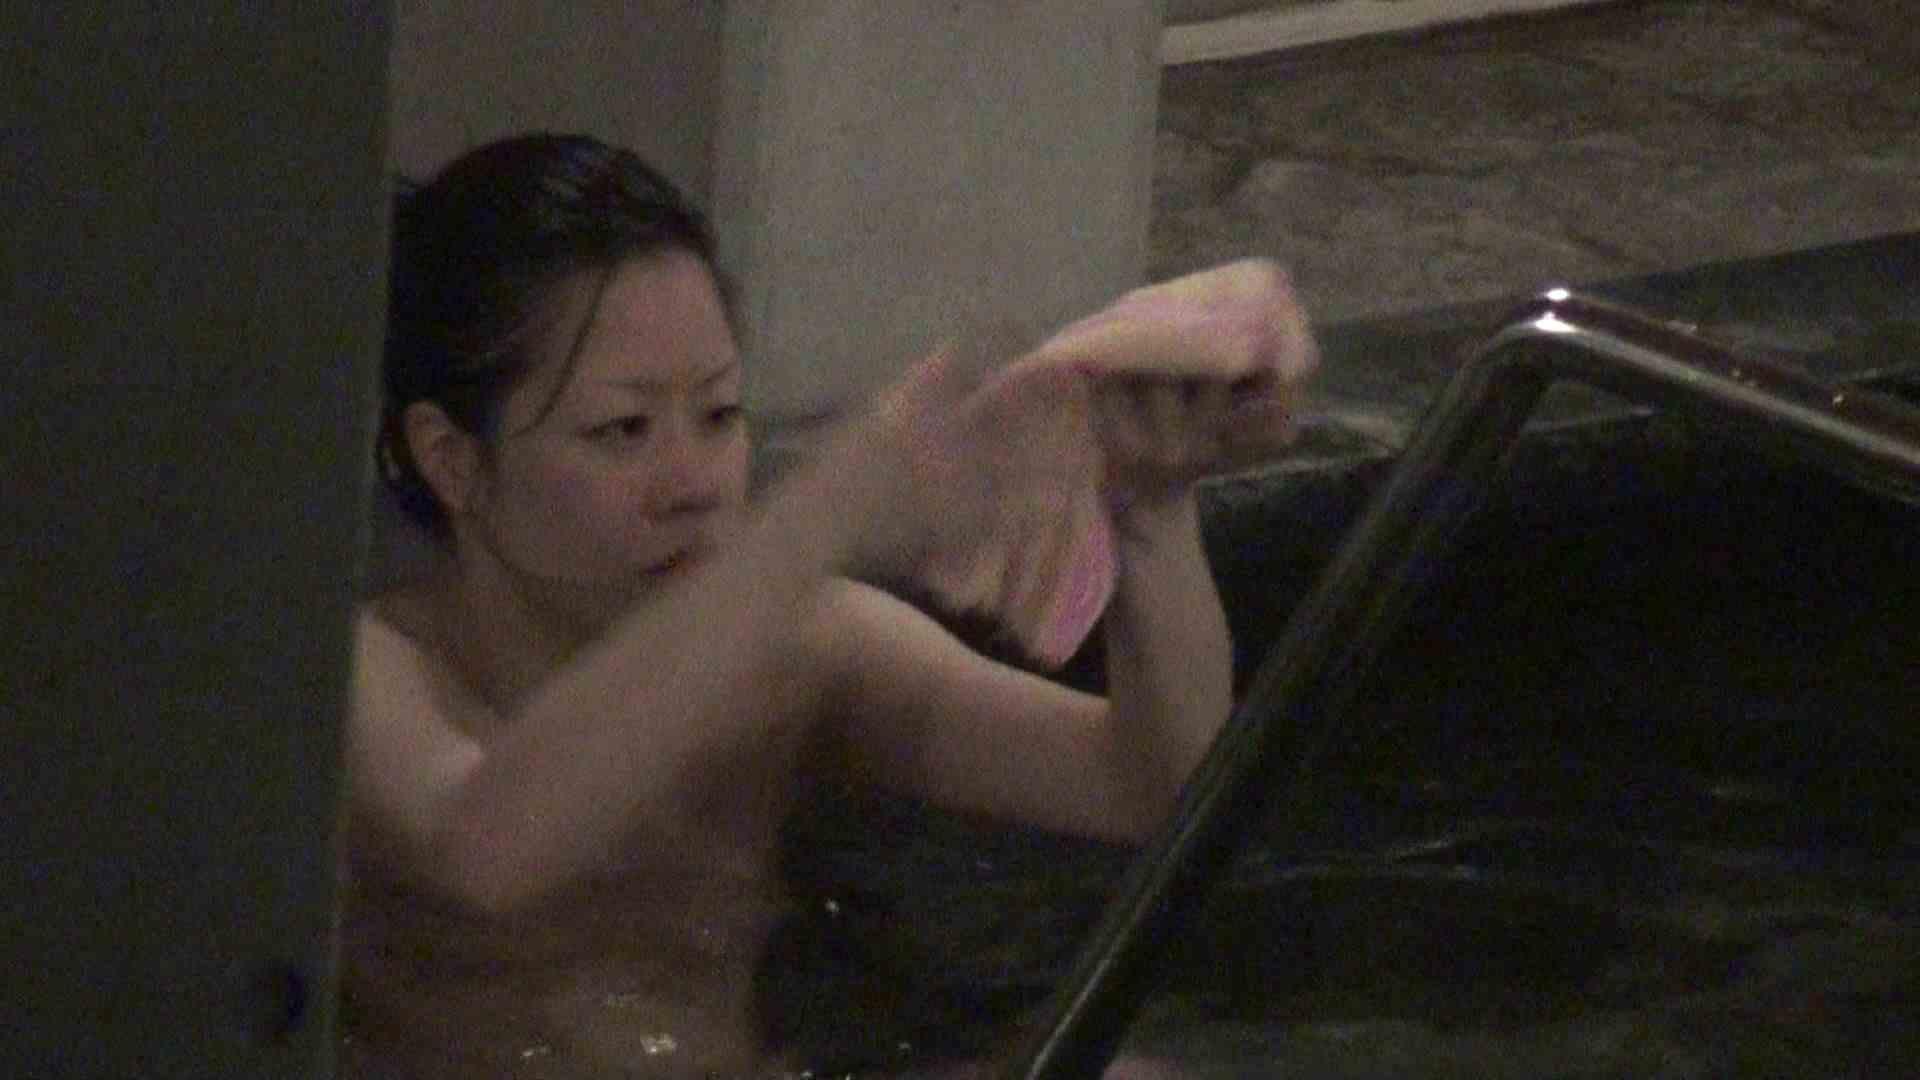 Aquaな露天風呂Vol.324 盗撮シリーズ | 露天風呂編  109PIX 67